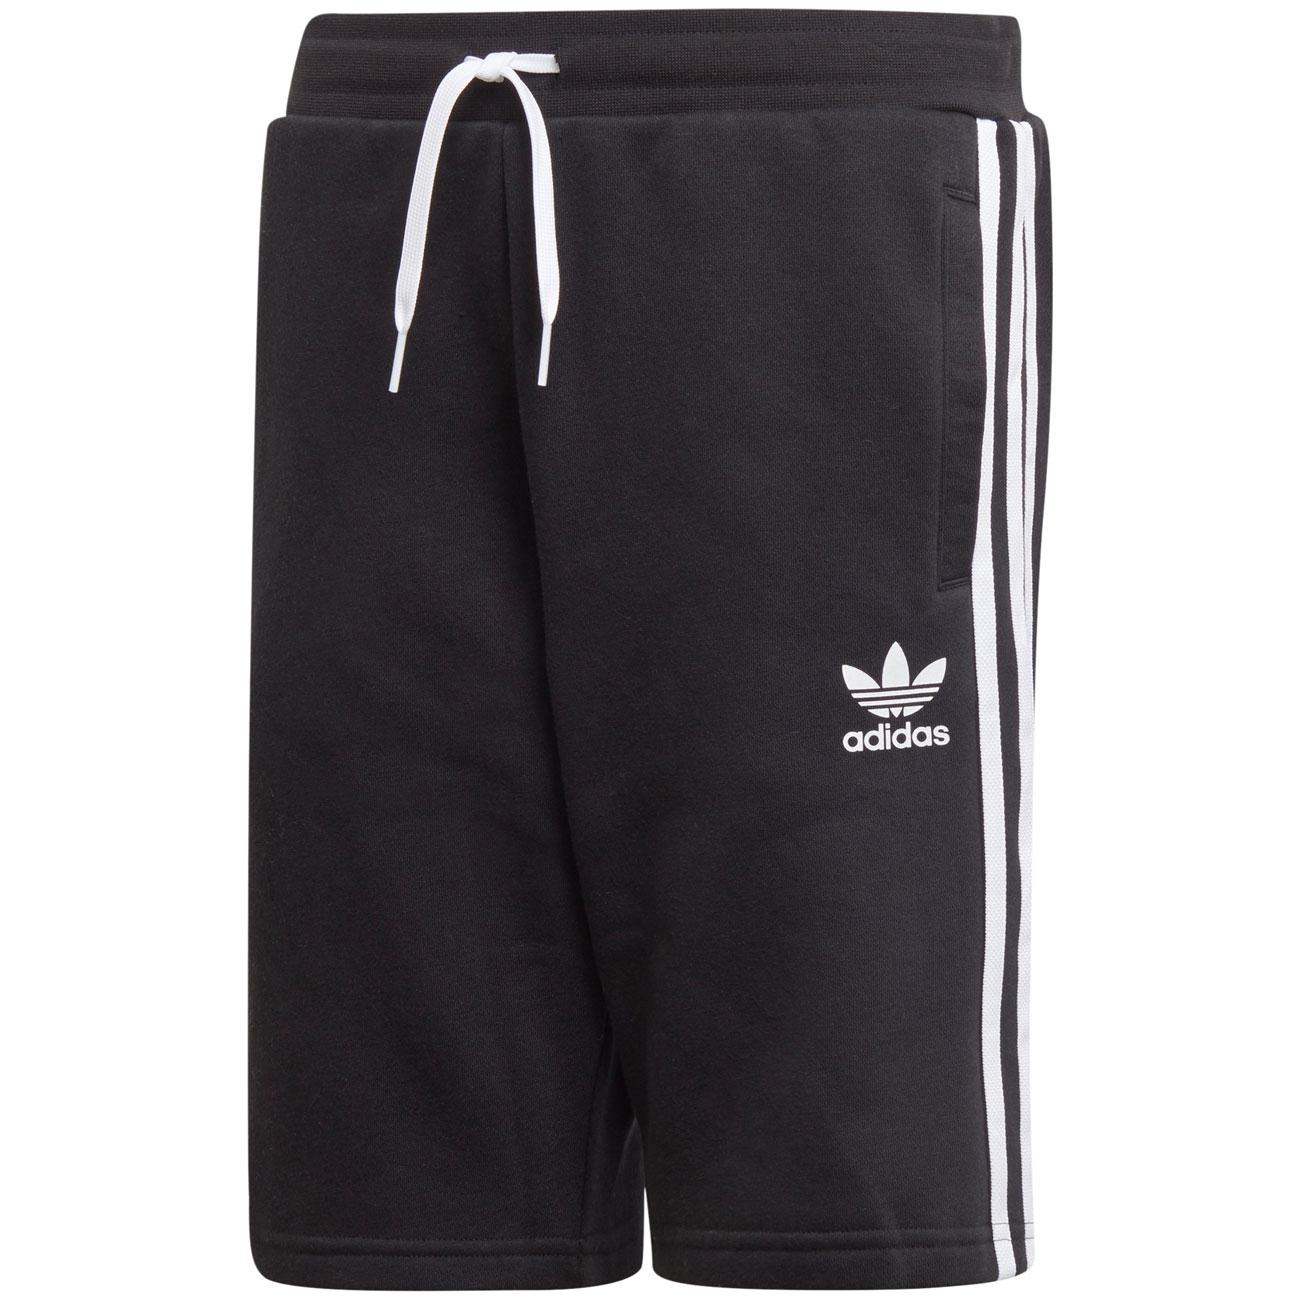 d8faa391f05 adidas Fleece Shorts Black/White